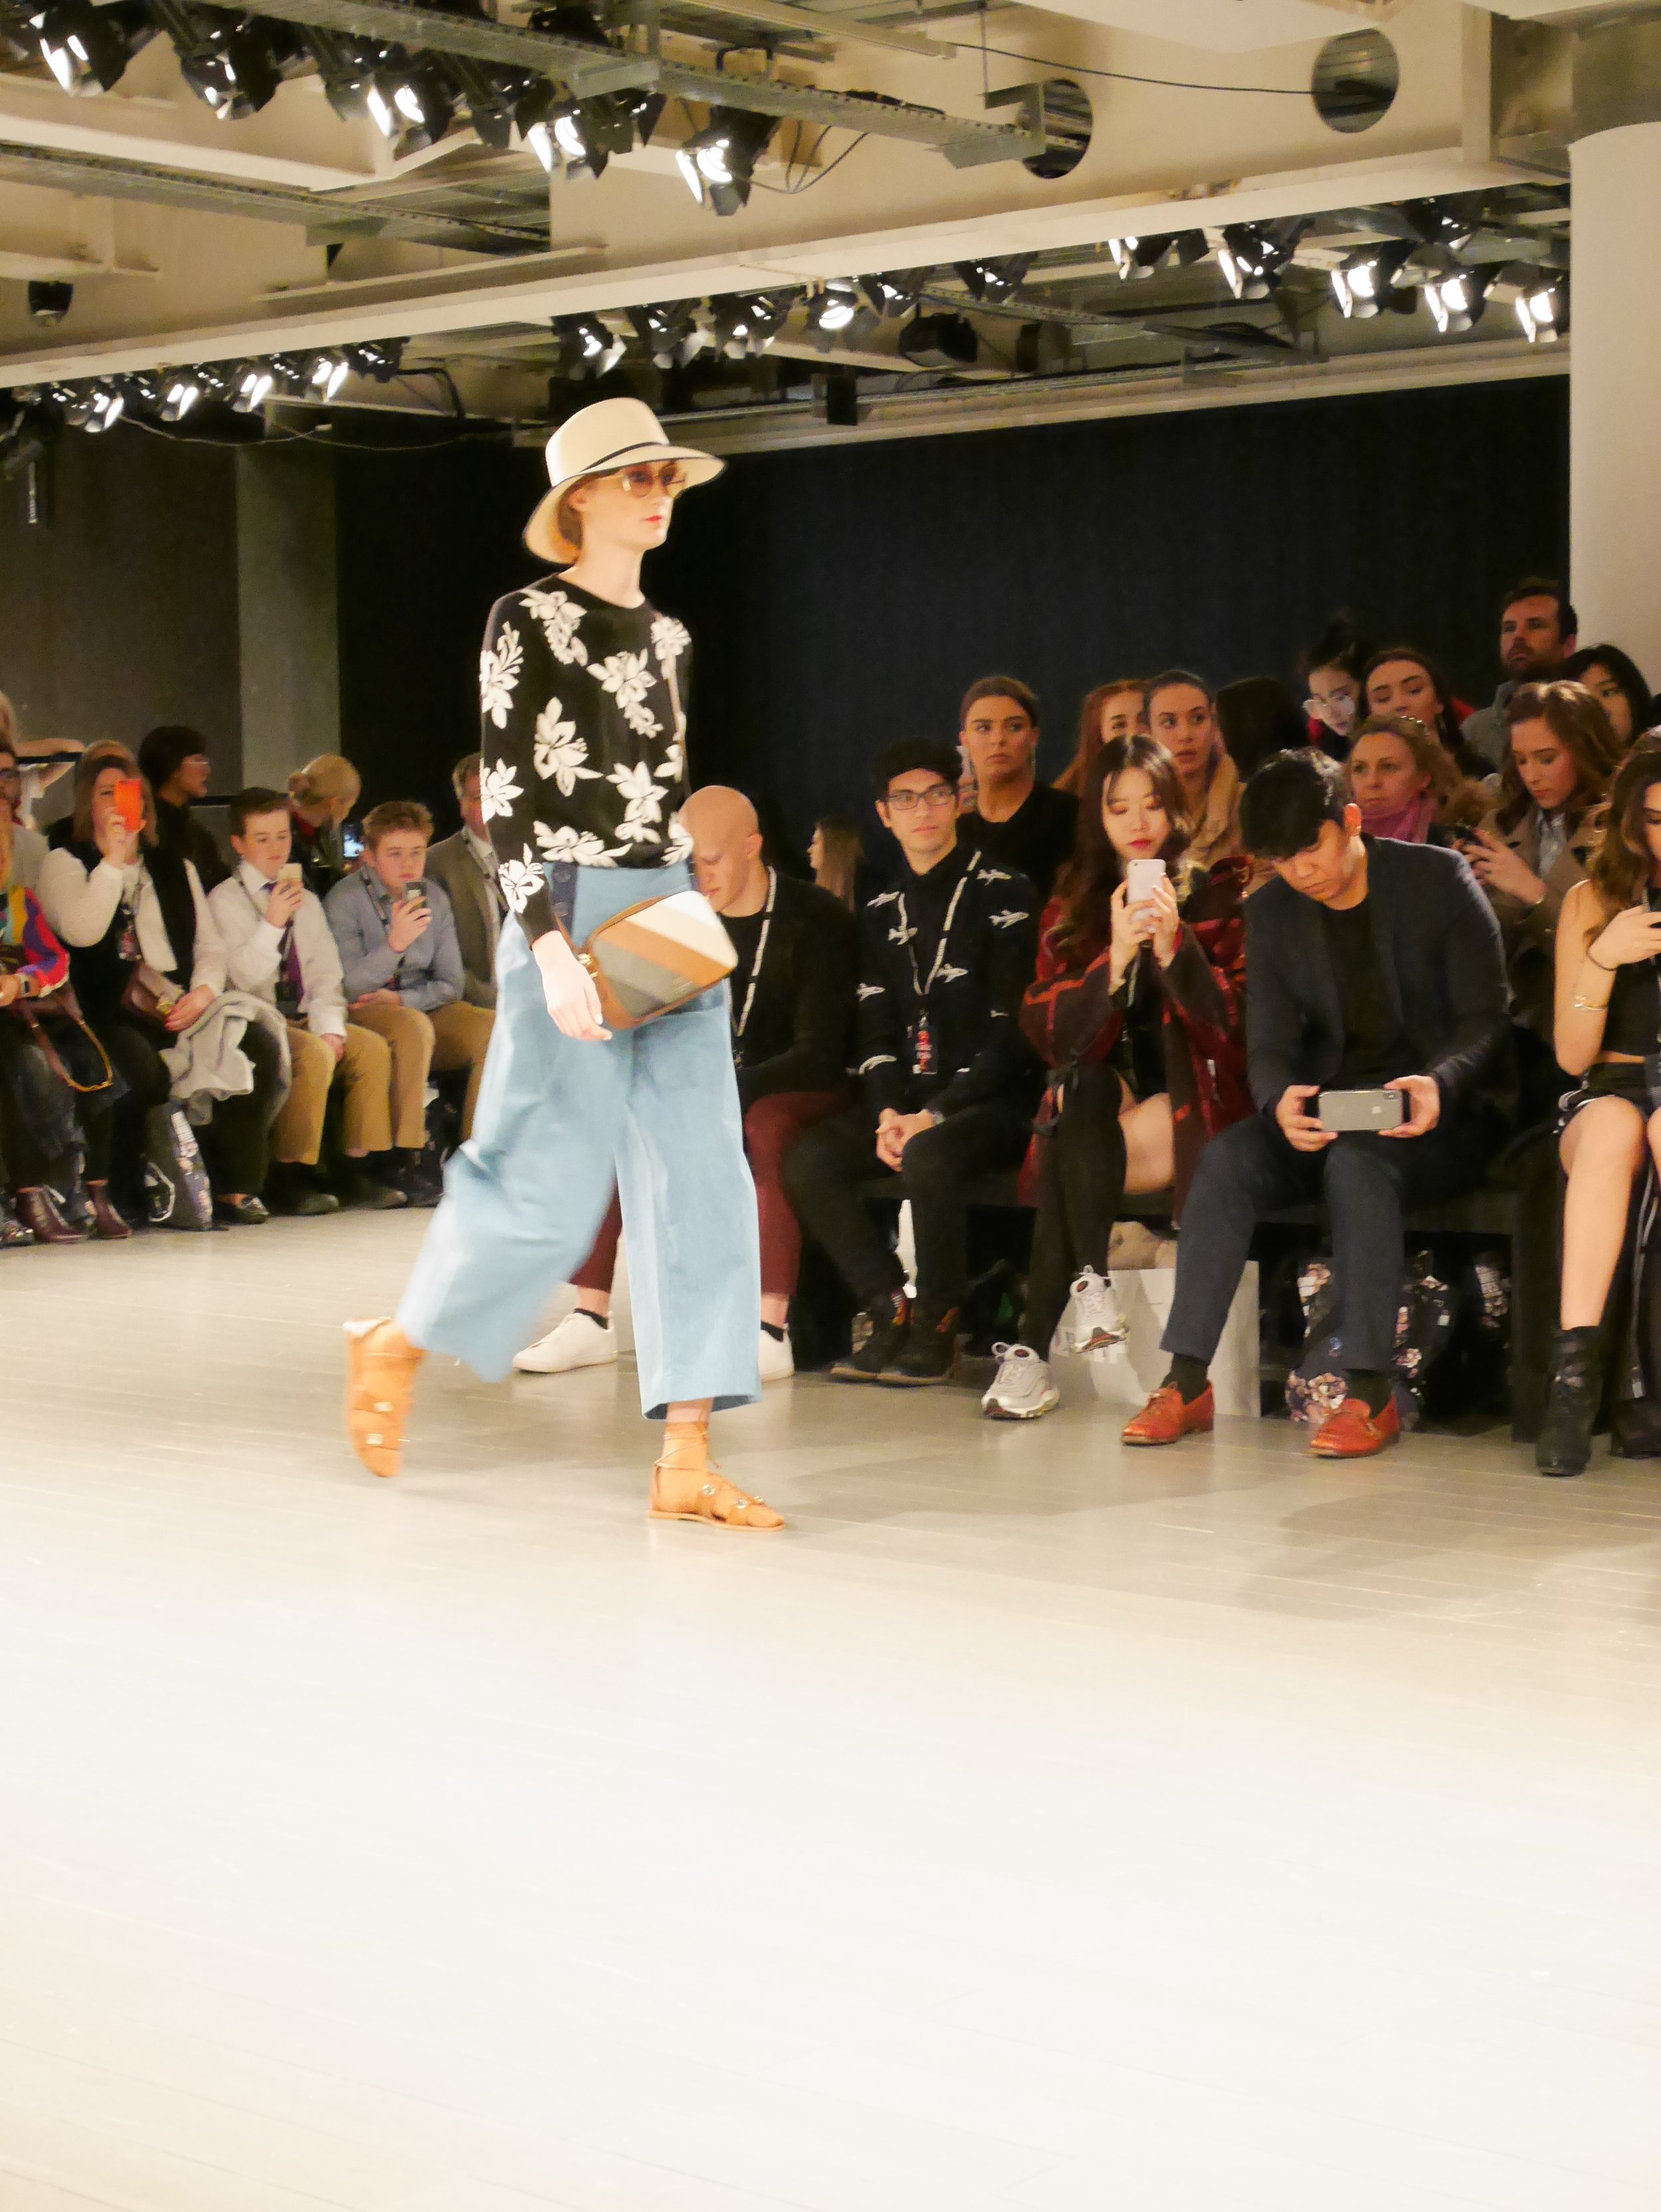 London-fashion-week-festival-elisa-les-bons-tuyaux-7.jpg